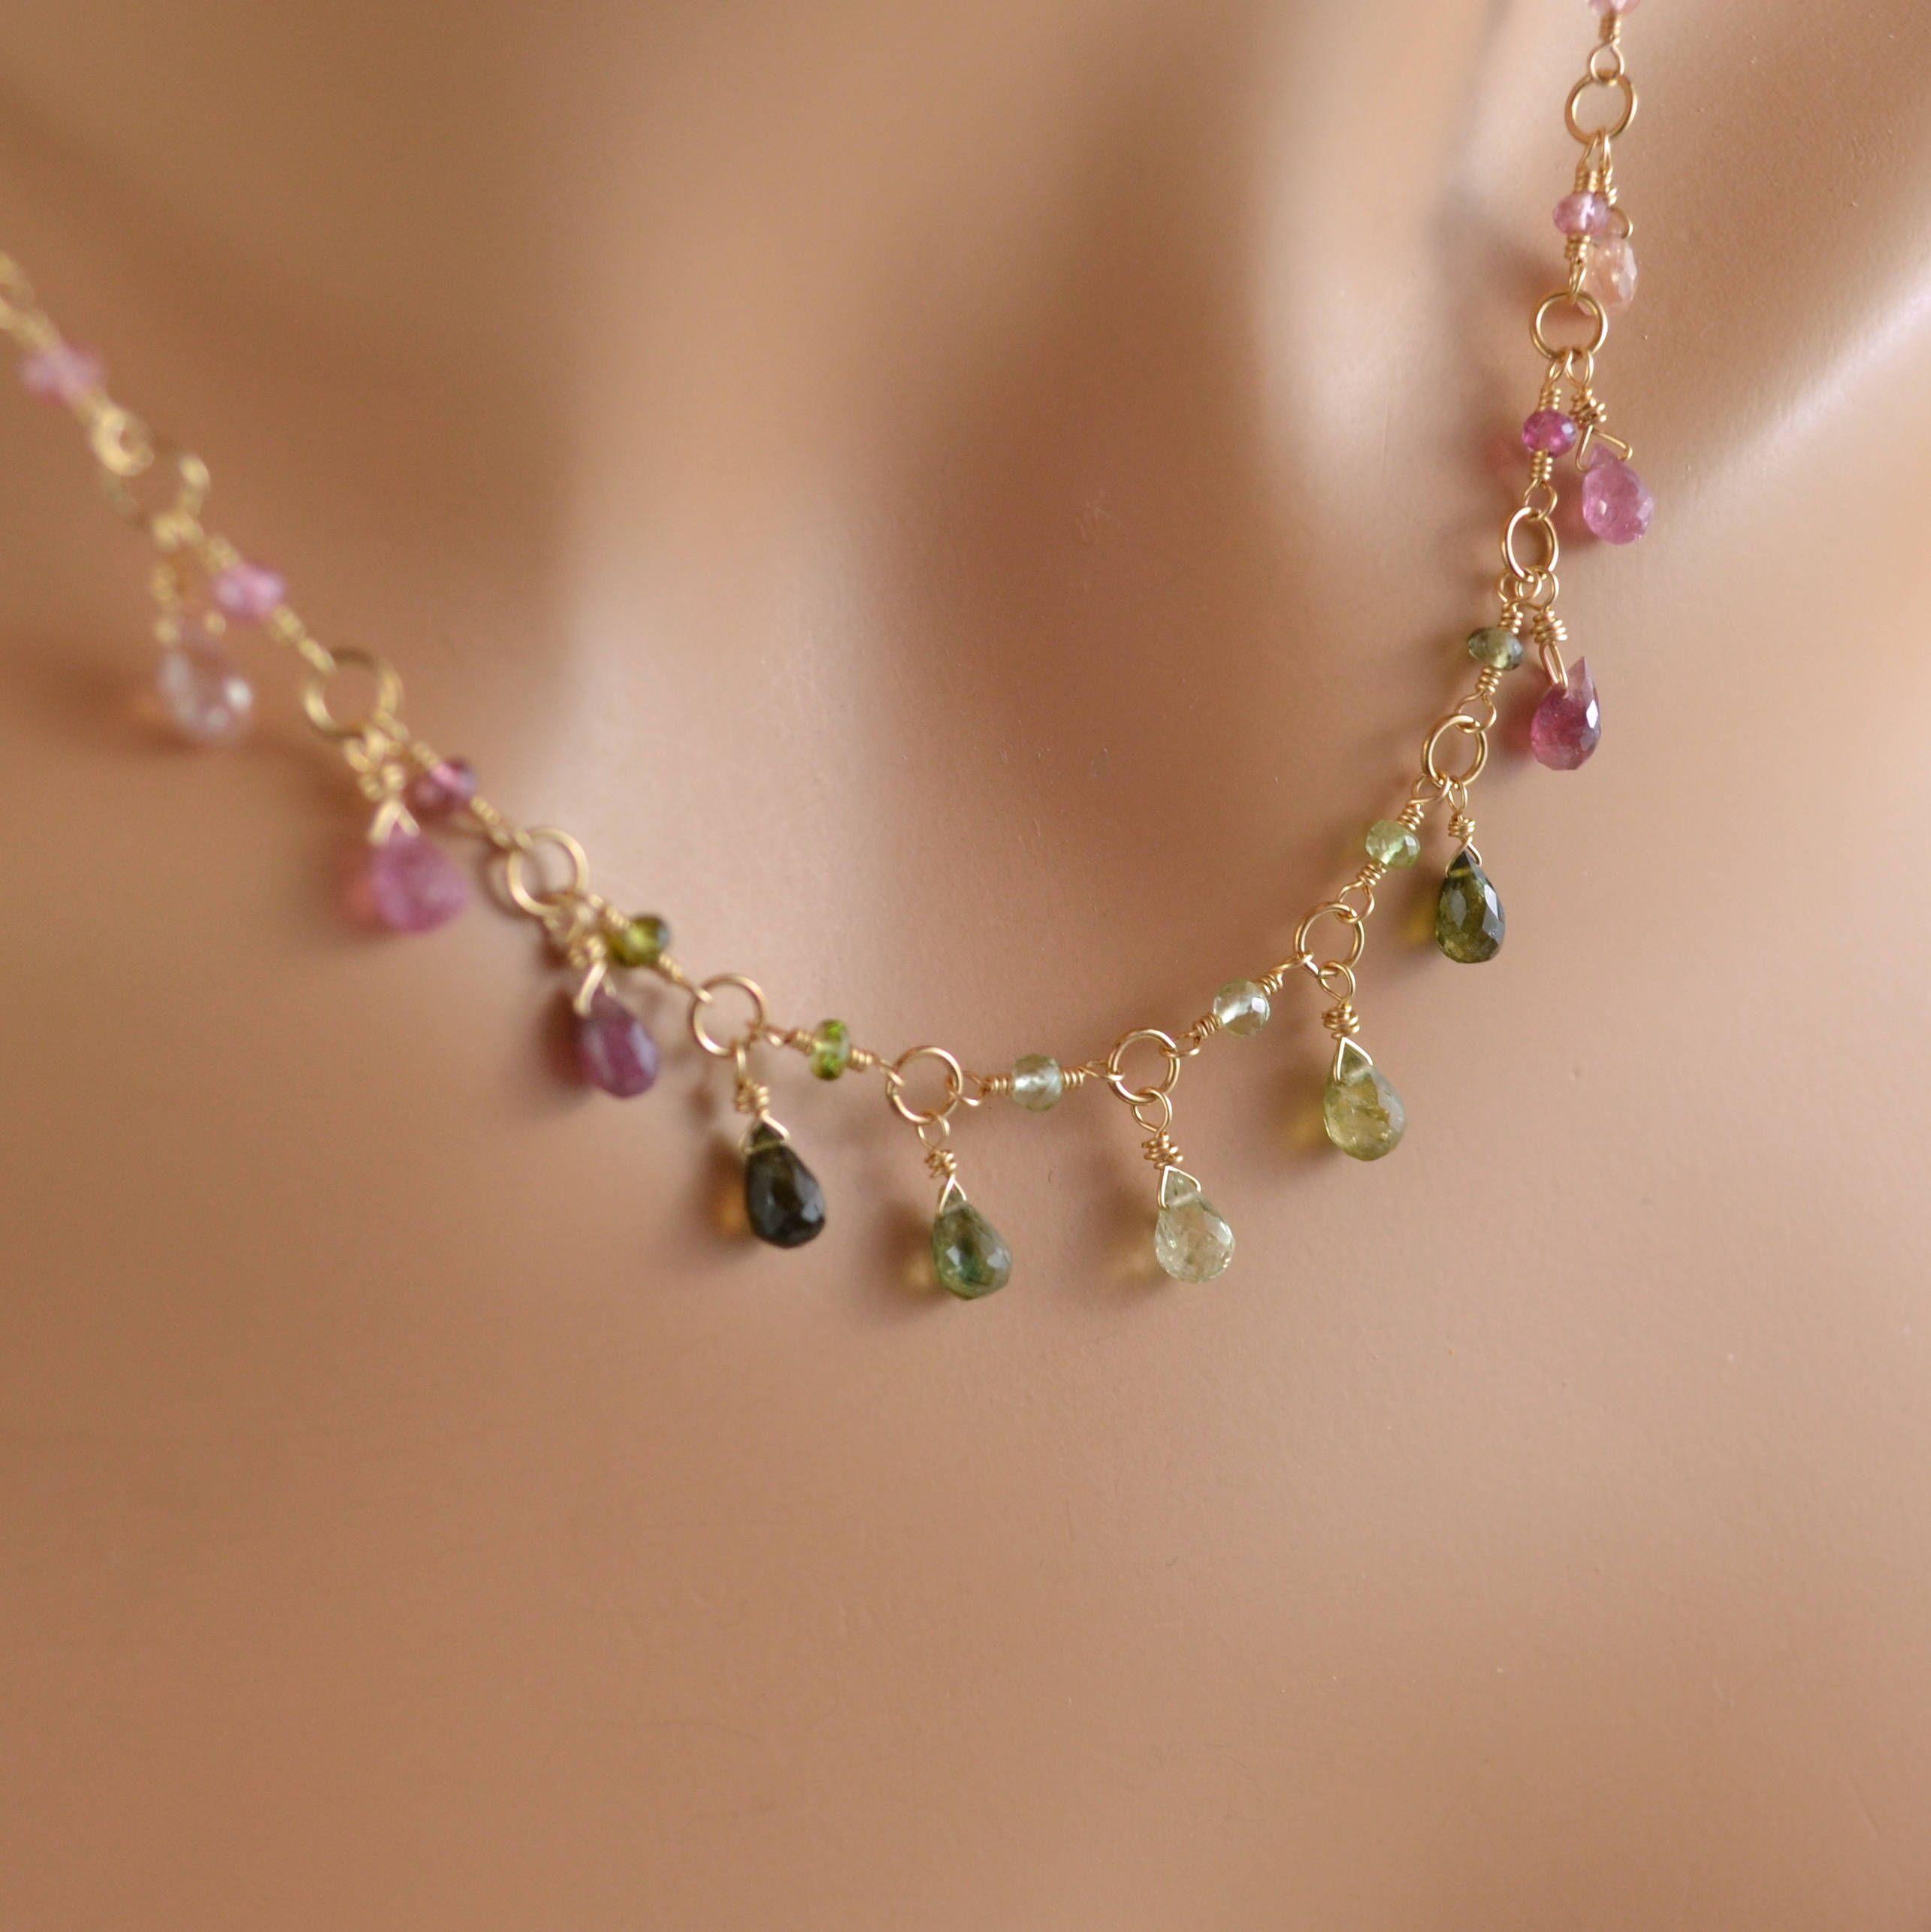 Genuine Ruby Earrings Berry Red Gemstone Cluster Cascade July Birthstone 14k Gold Filled